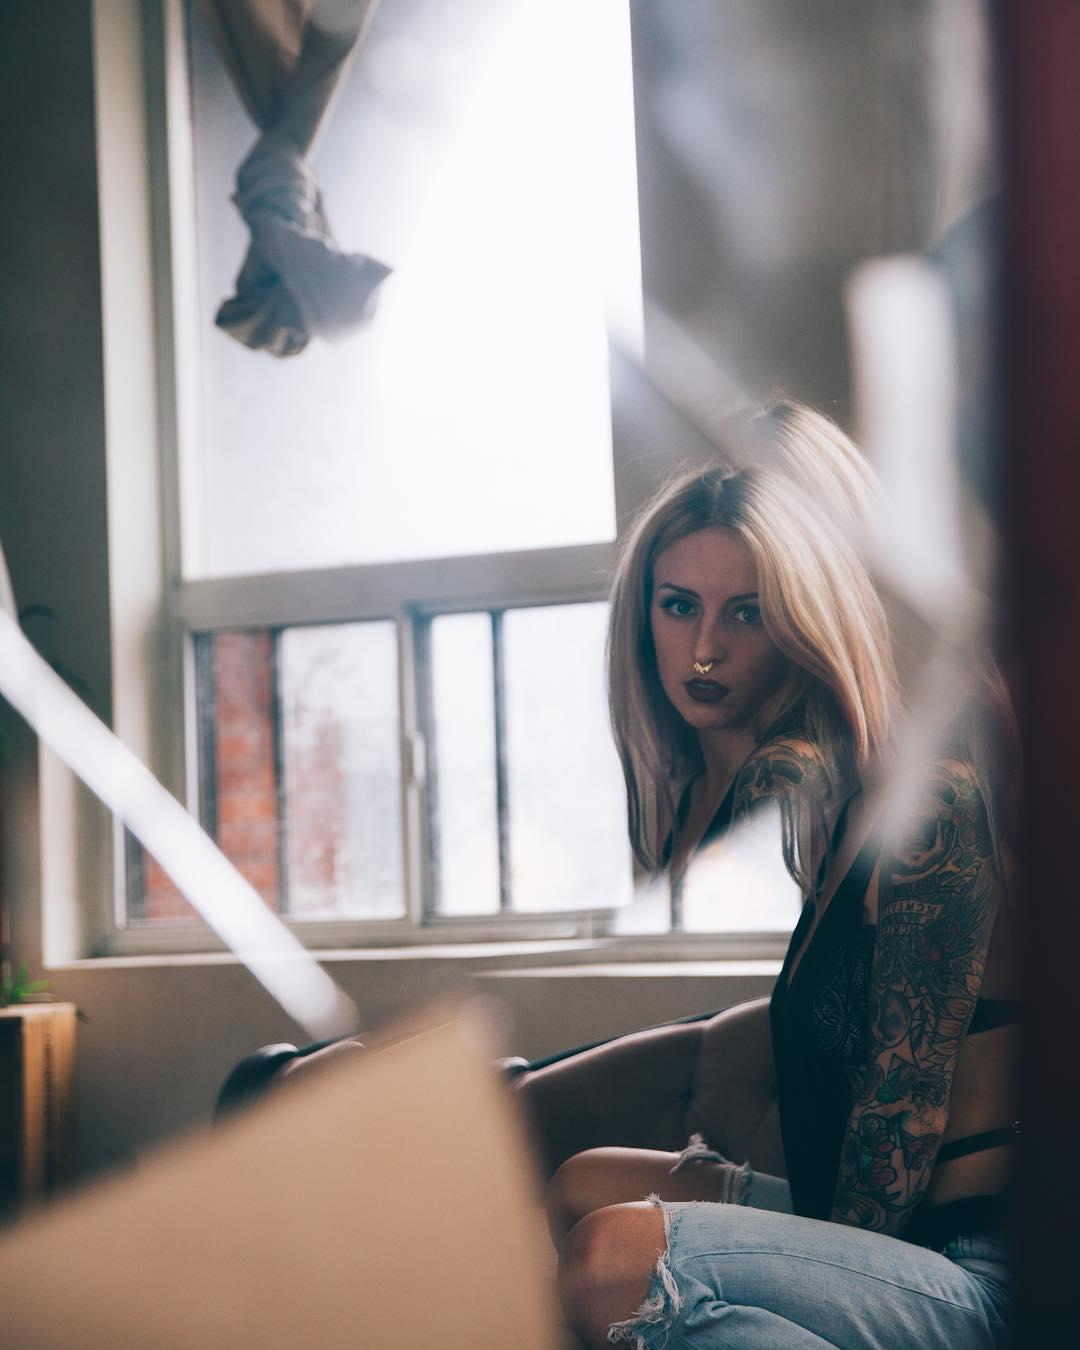 HD wallpaper: suicide girls janesinner suicide tattoo wet